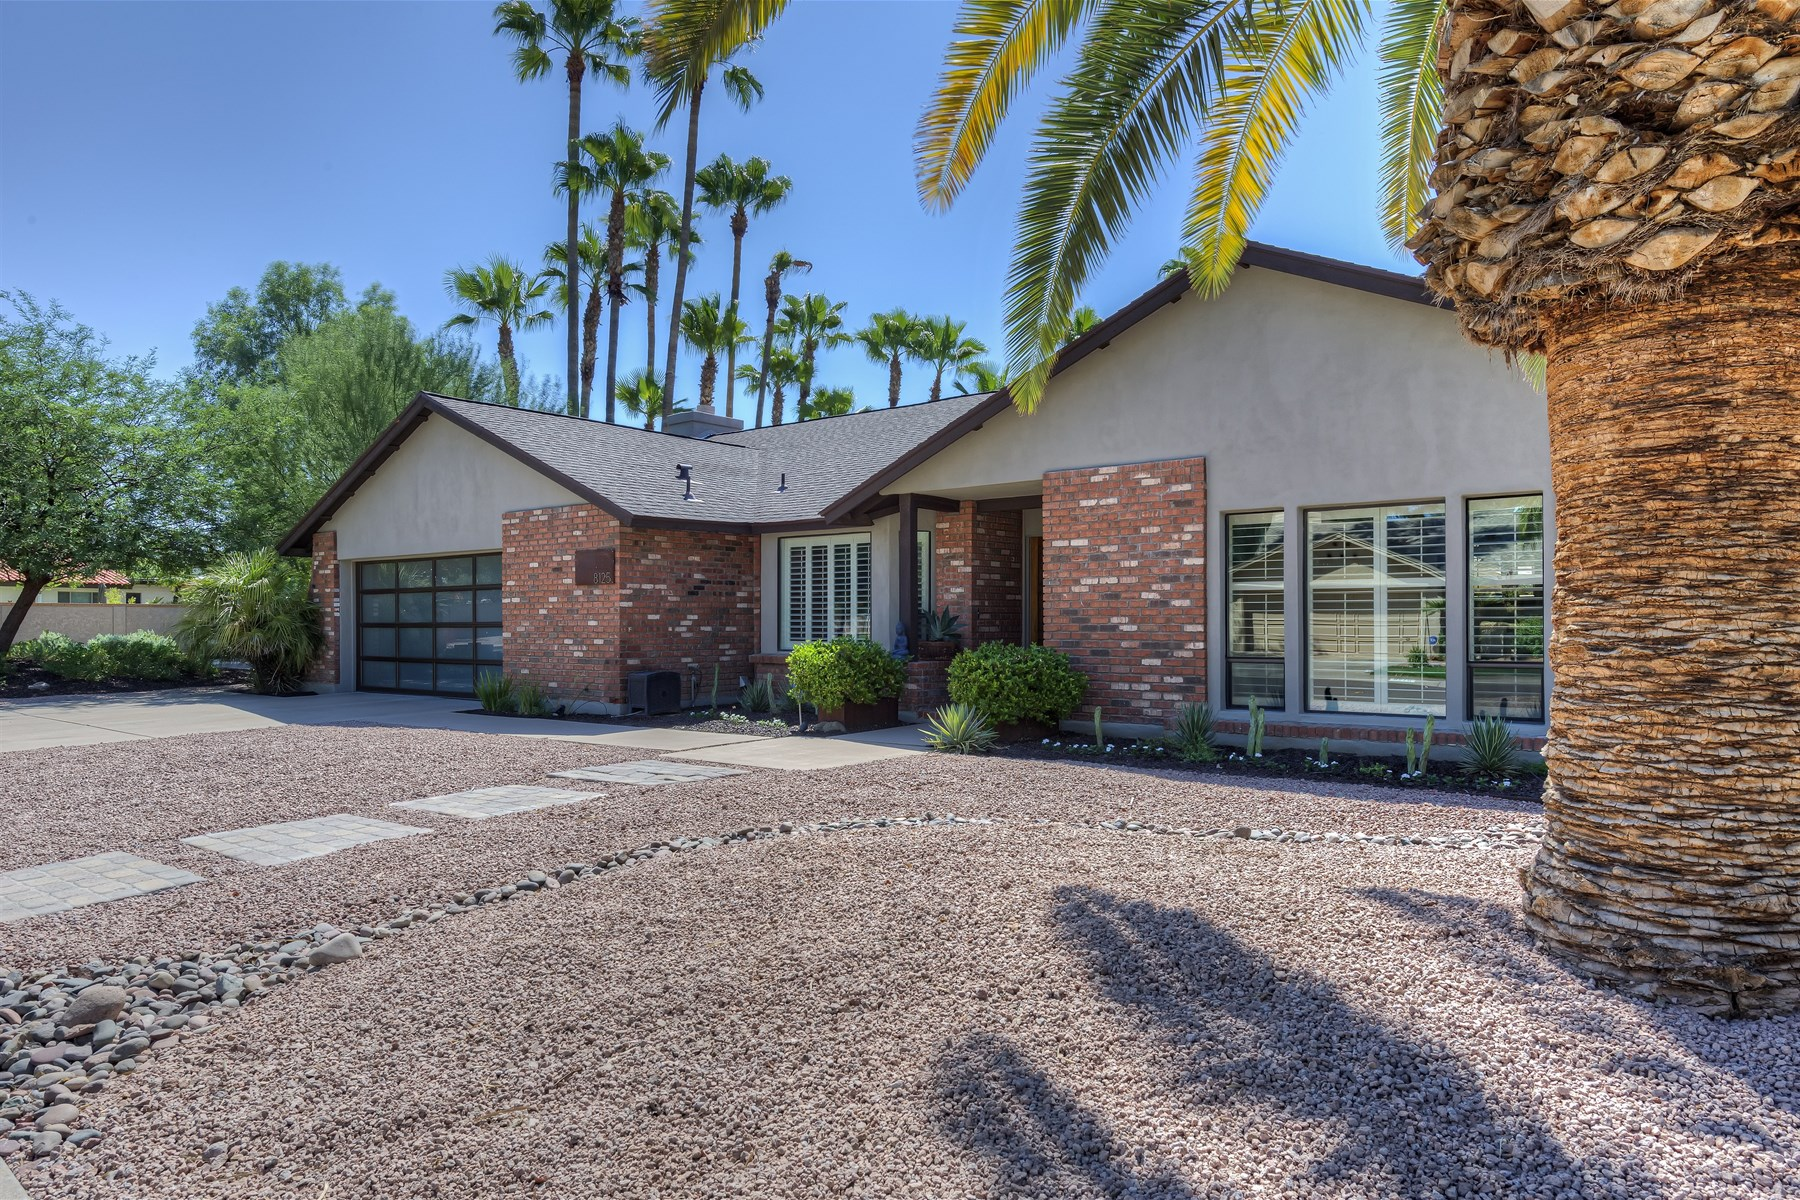 Casa para uma família para Venda às Located in the Arabian Trail Loop just steps from the greenbelt. 8125 E Ferzon Trl Scottsdale, Arizona 85258 Estados Unidos